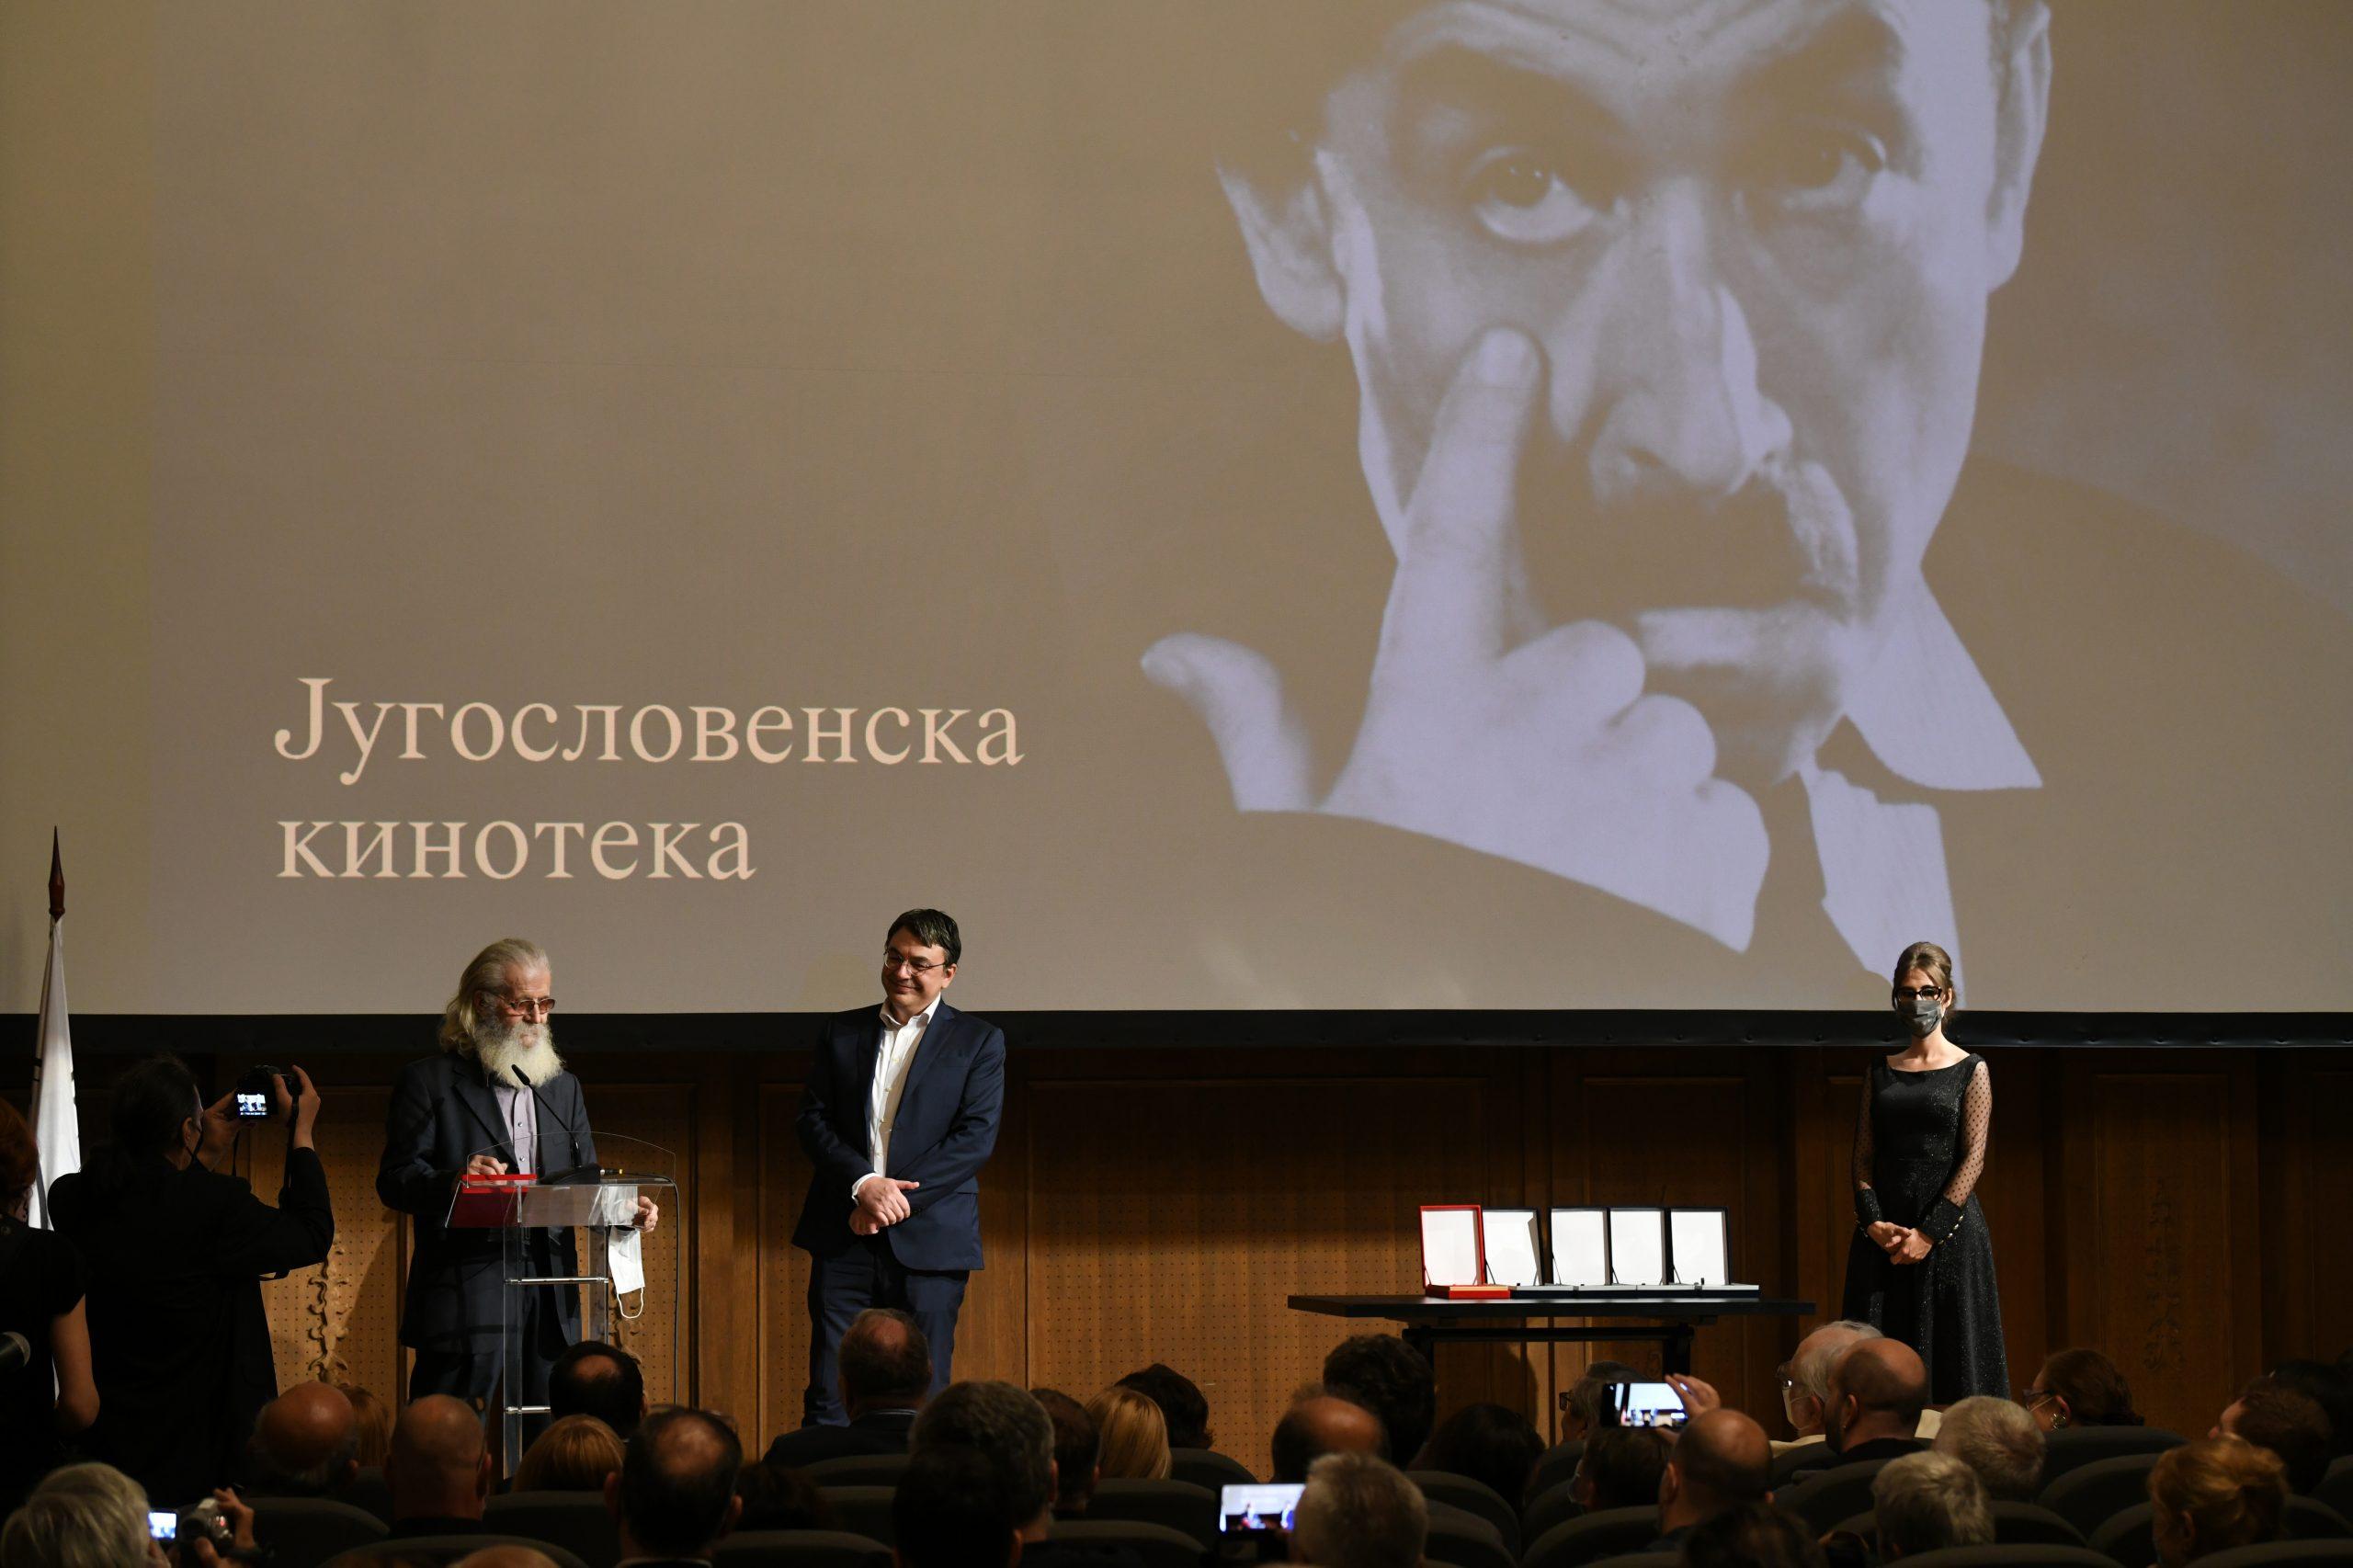 Jugoslovenska kinoteka dodela priznanja Zlatni pecat Milorad Jaksic Fandjo i Jugoslav Pantelic